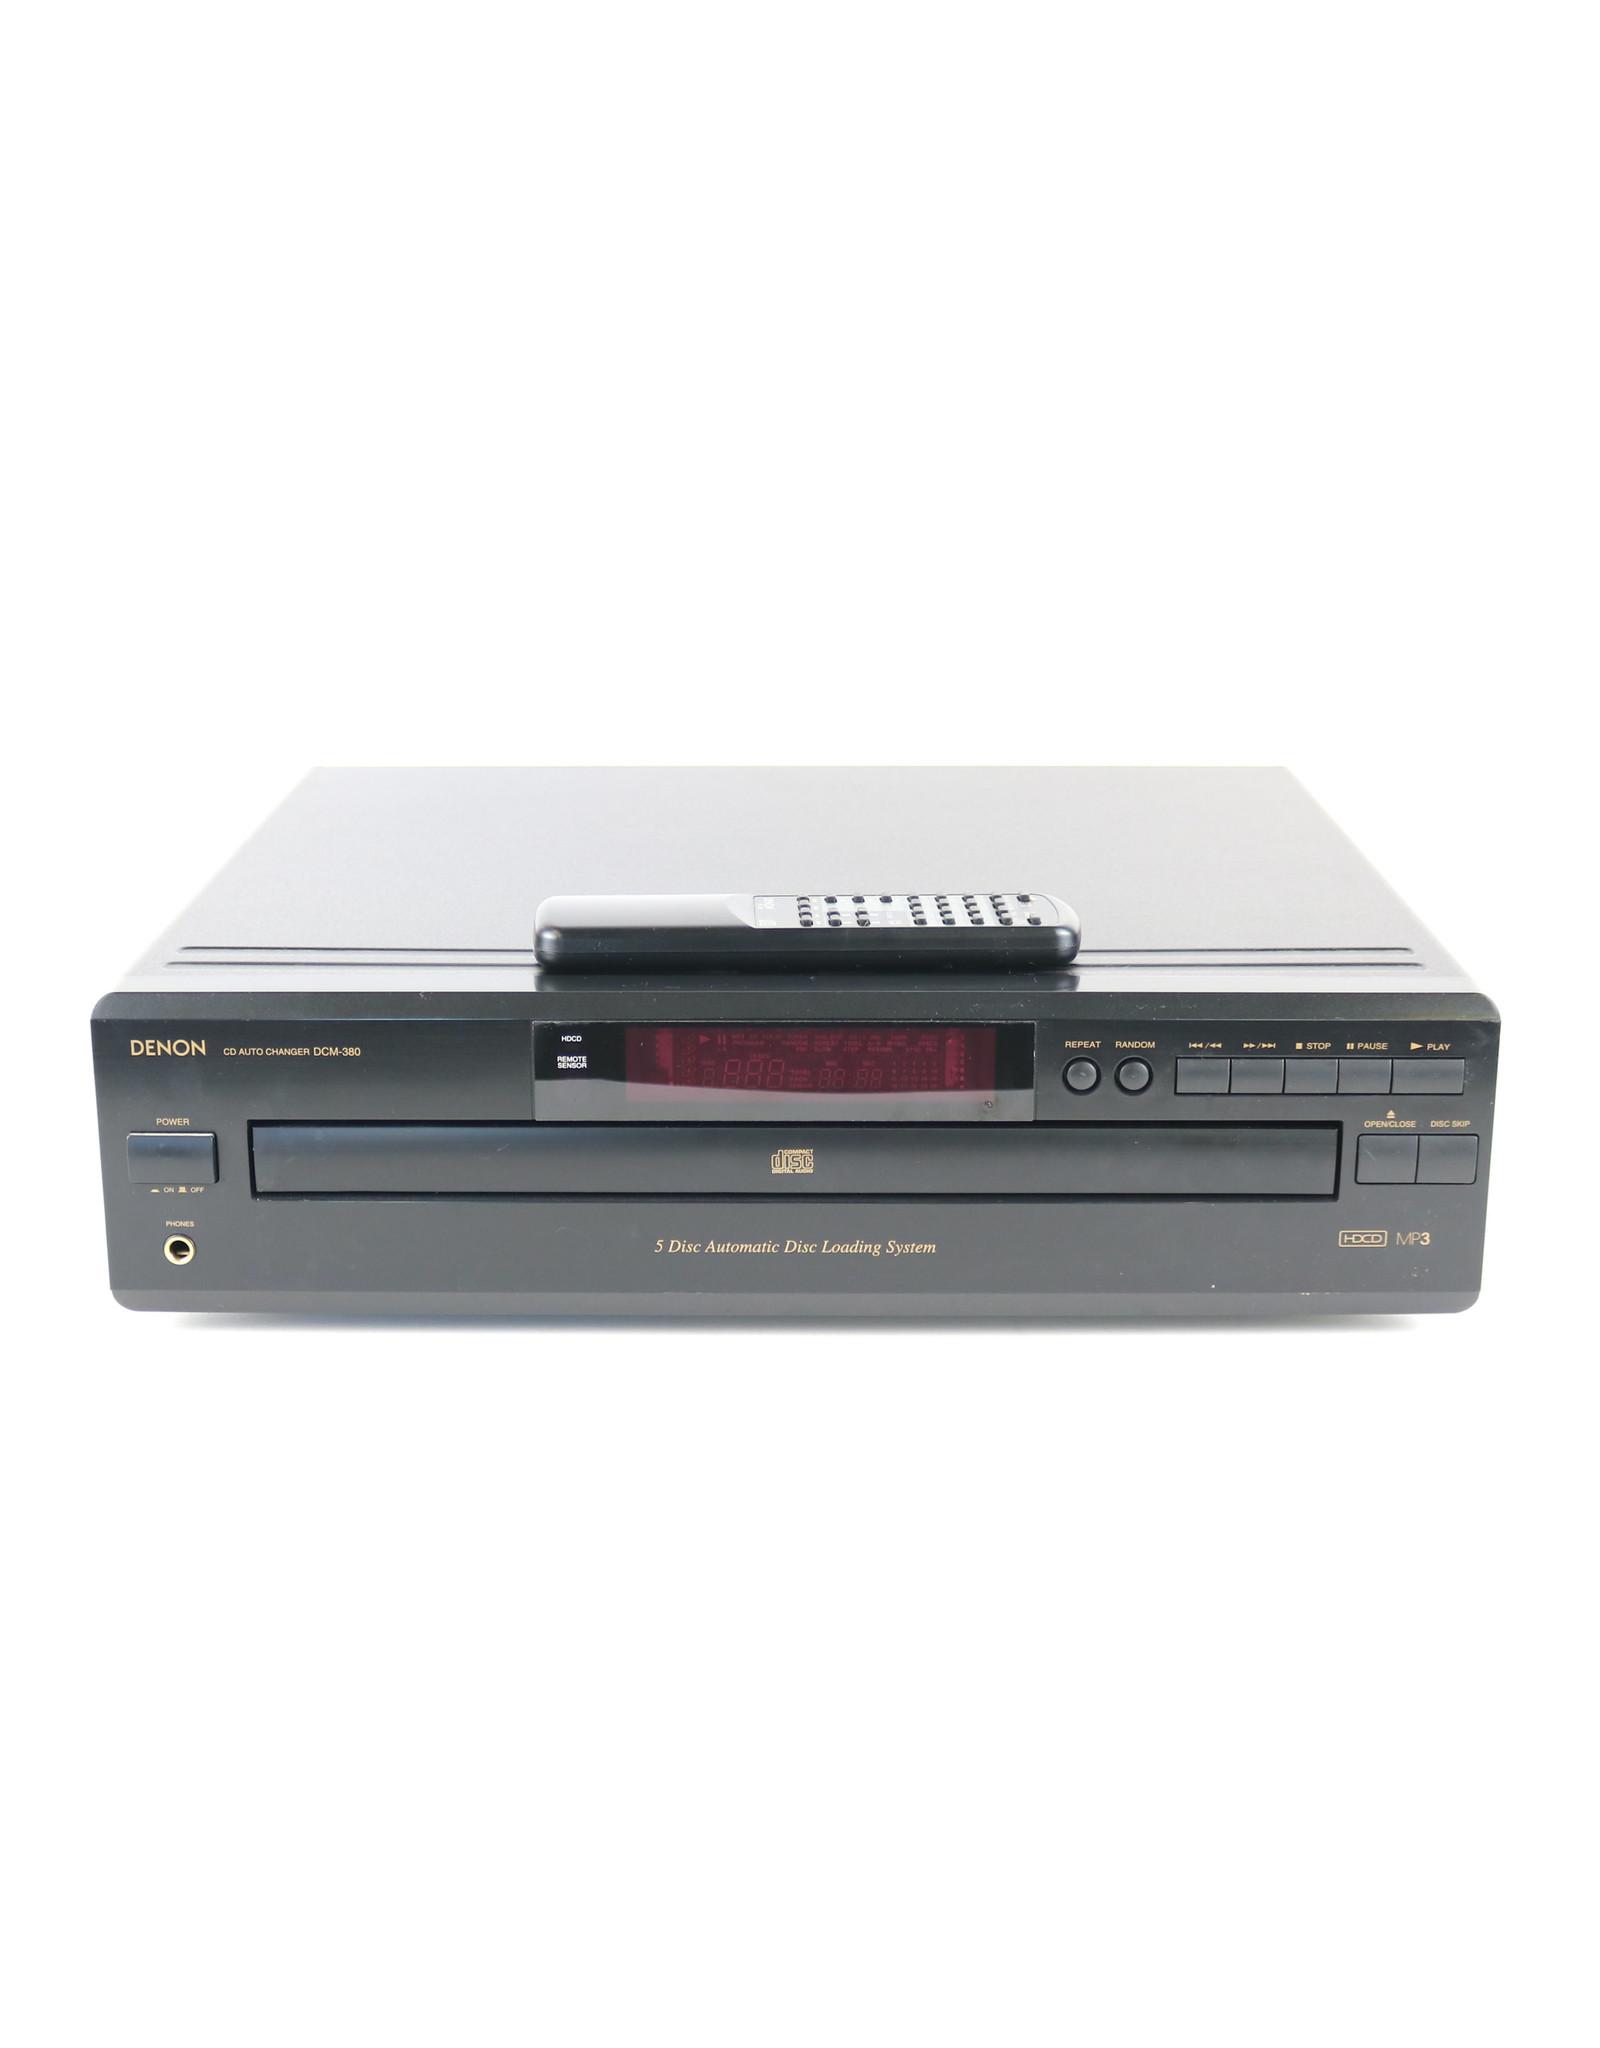 Denon Denon DCM-380 5-Disc CD Changer USED